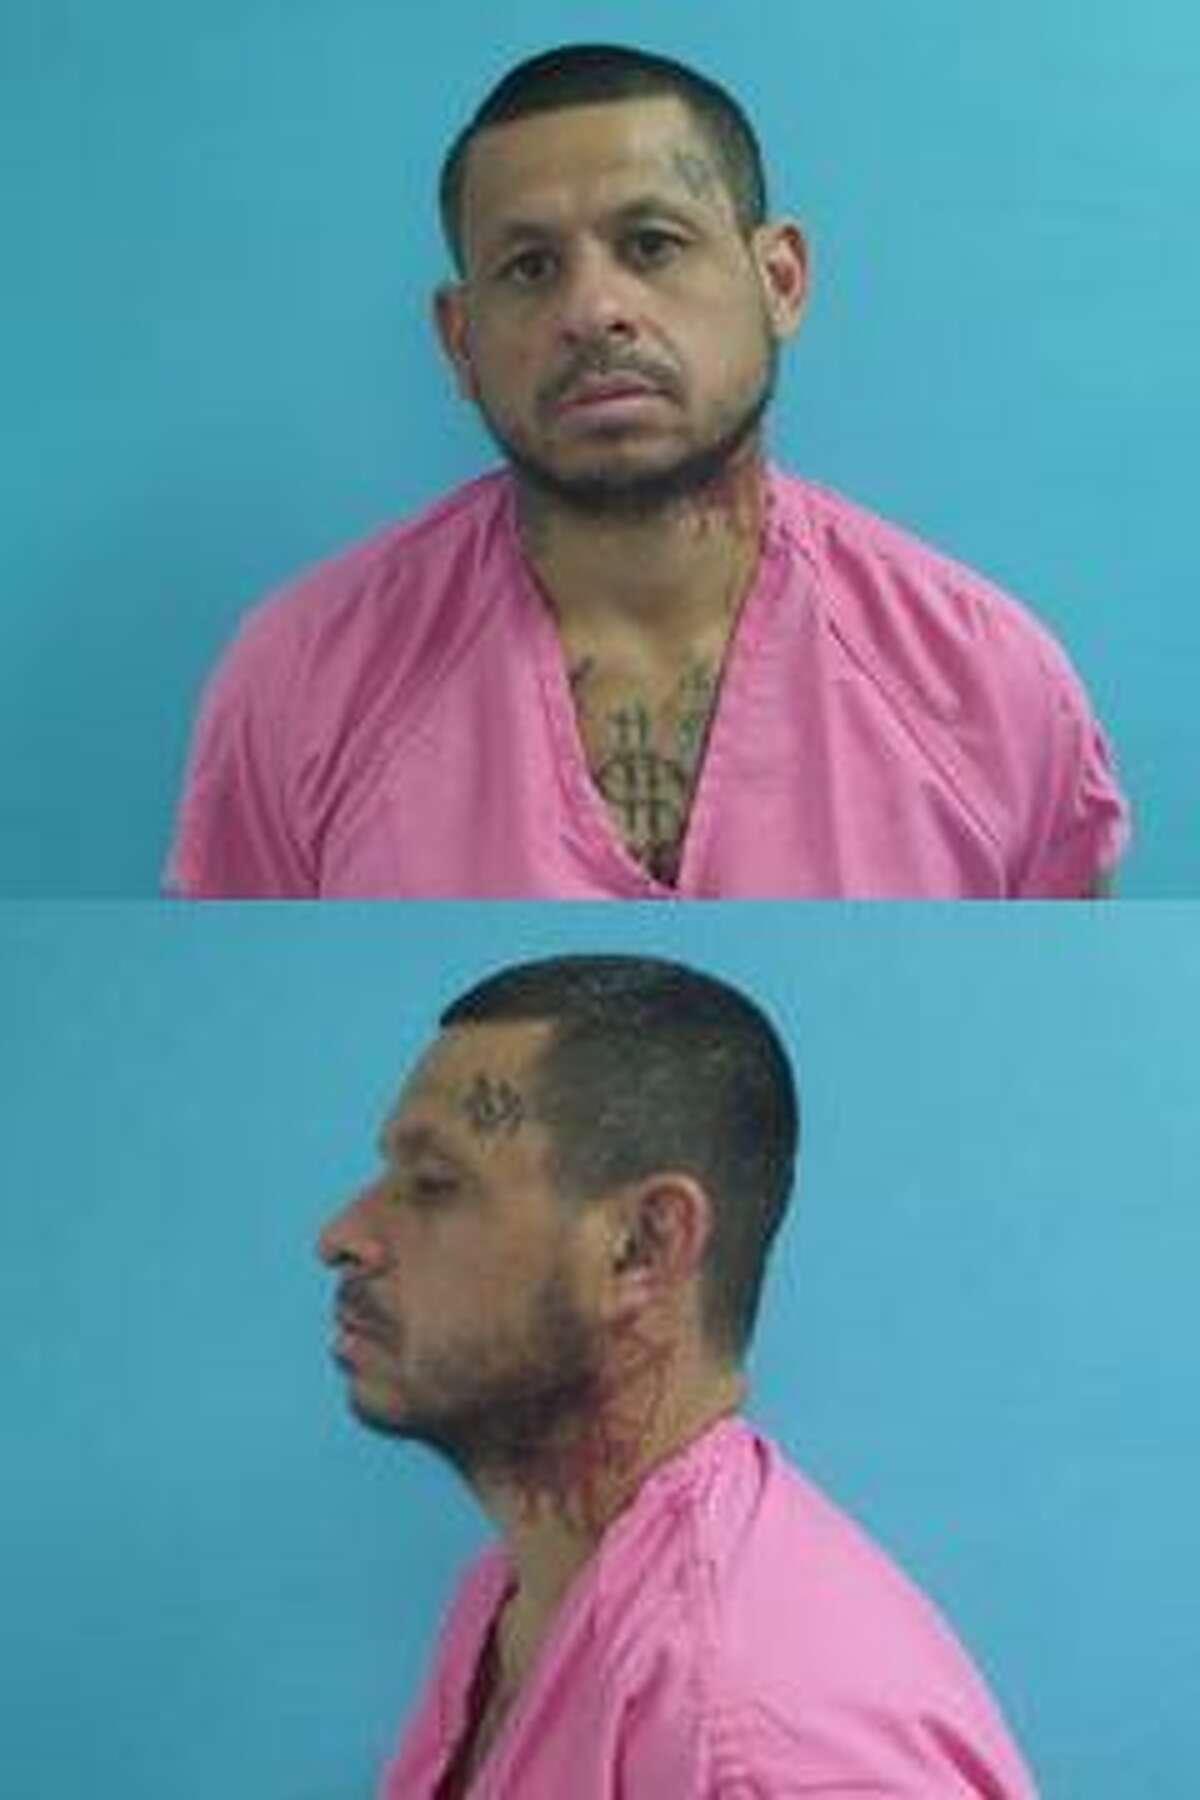 Thomas John McMahon, 39, has been charged with parole violation, according to Aransas County jail records. His bond has been set at $50,000.